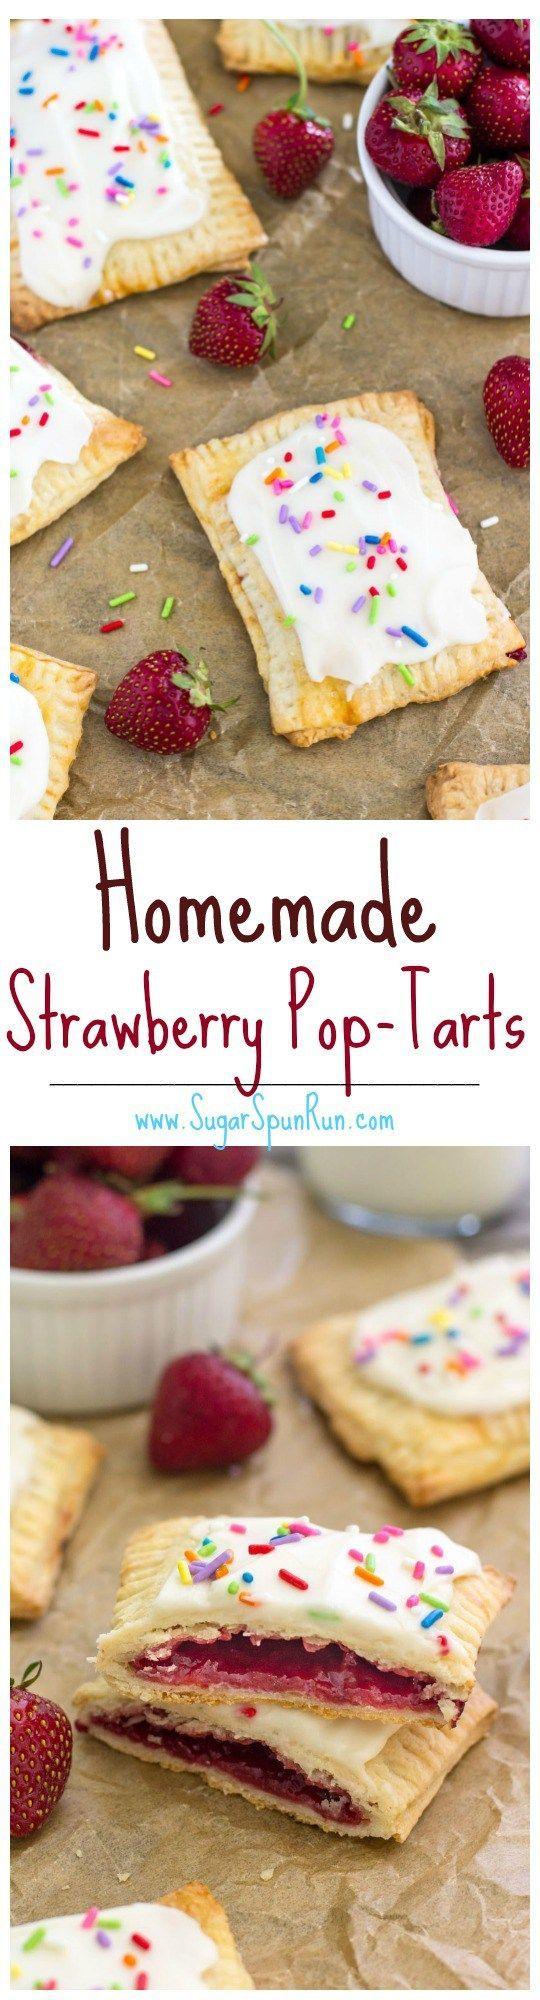 Homemade Strawberry Pop-Tarts -- SugarSpunRun